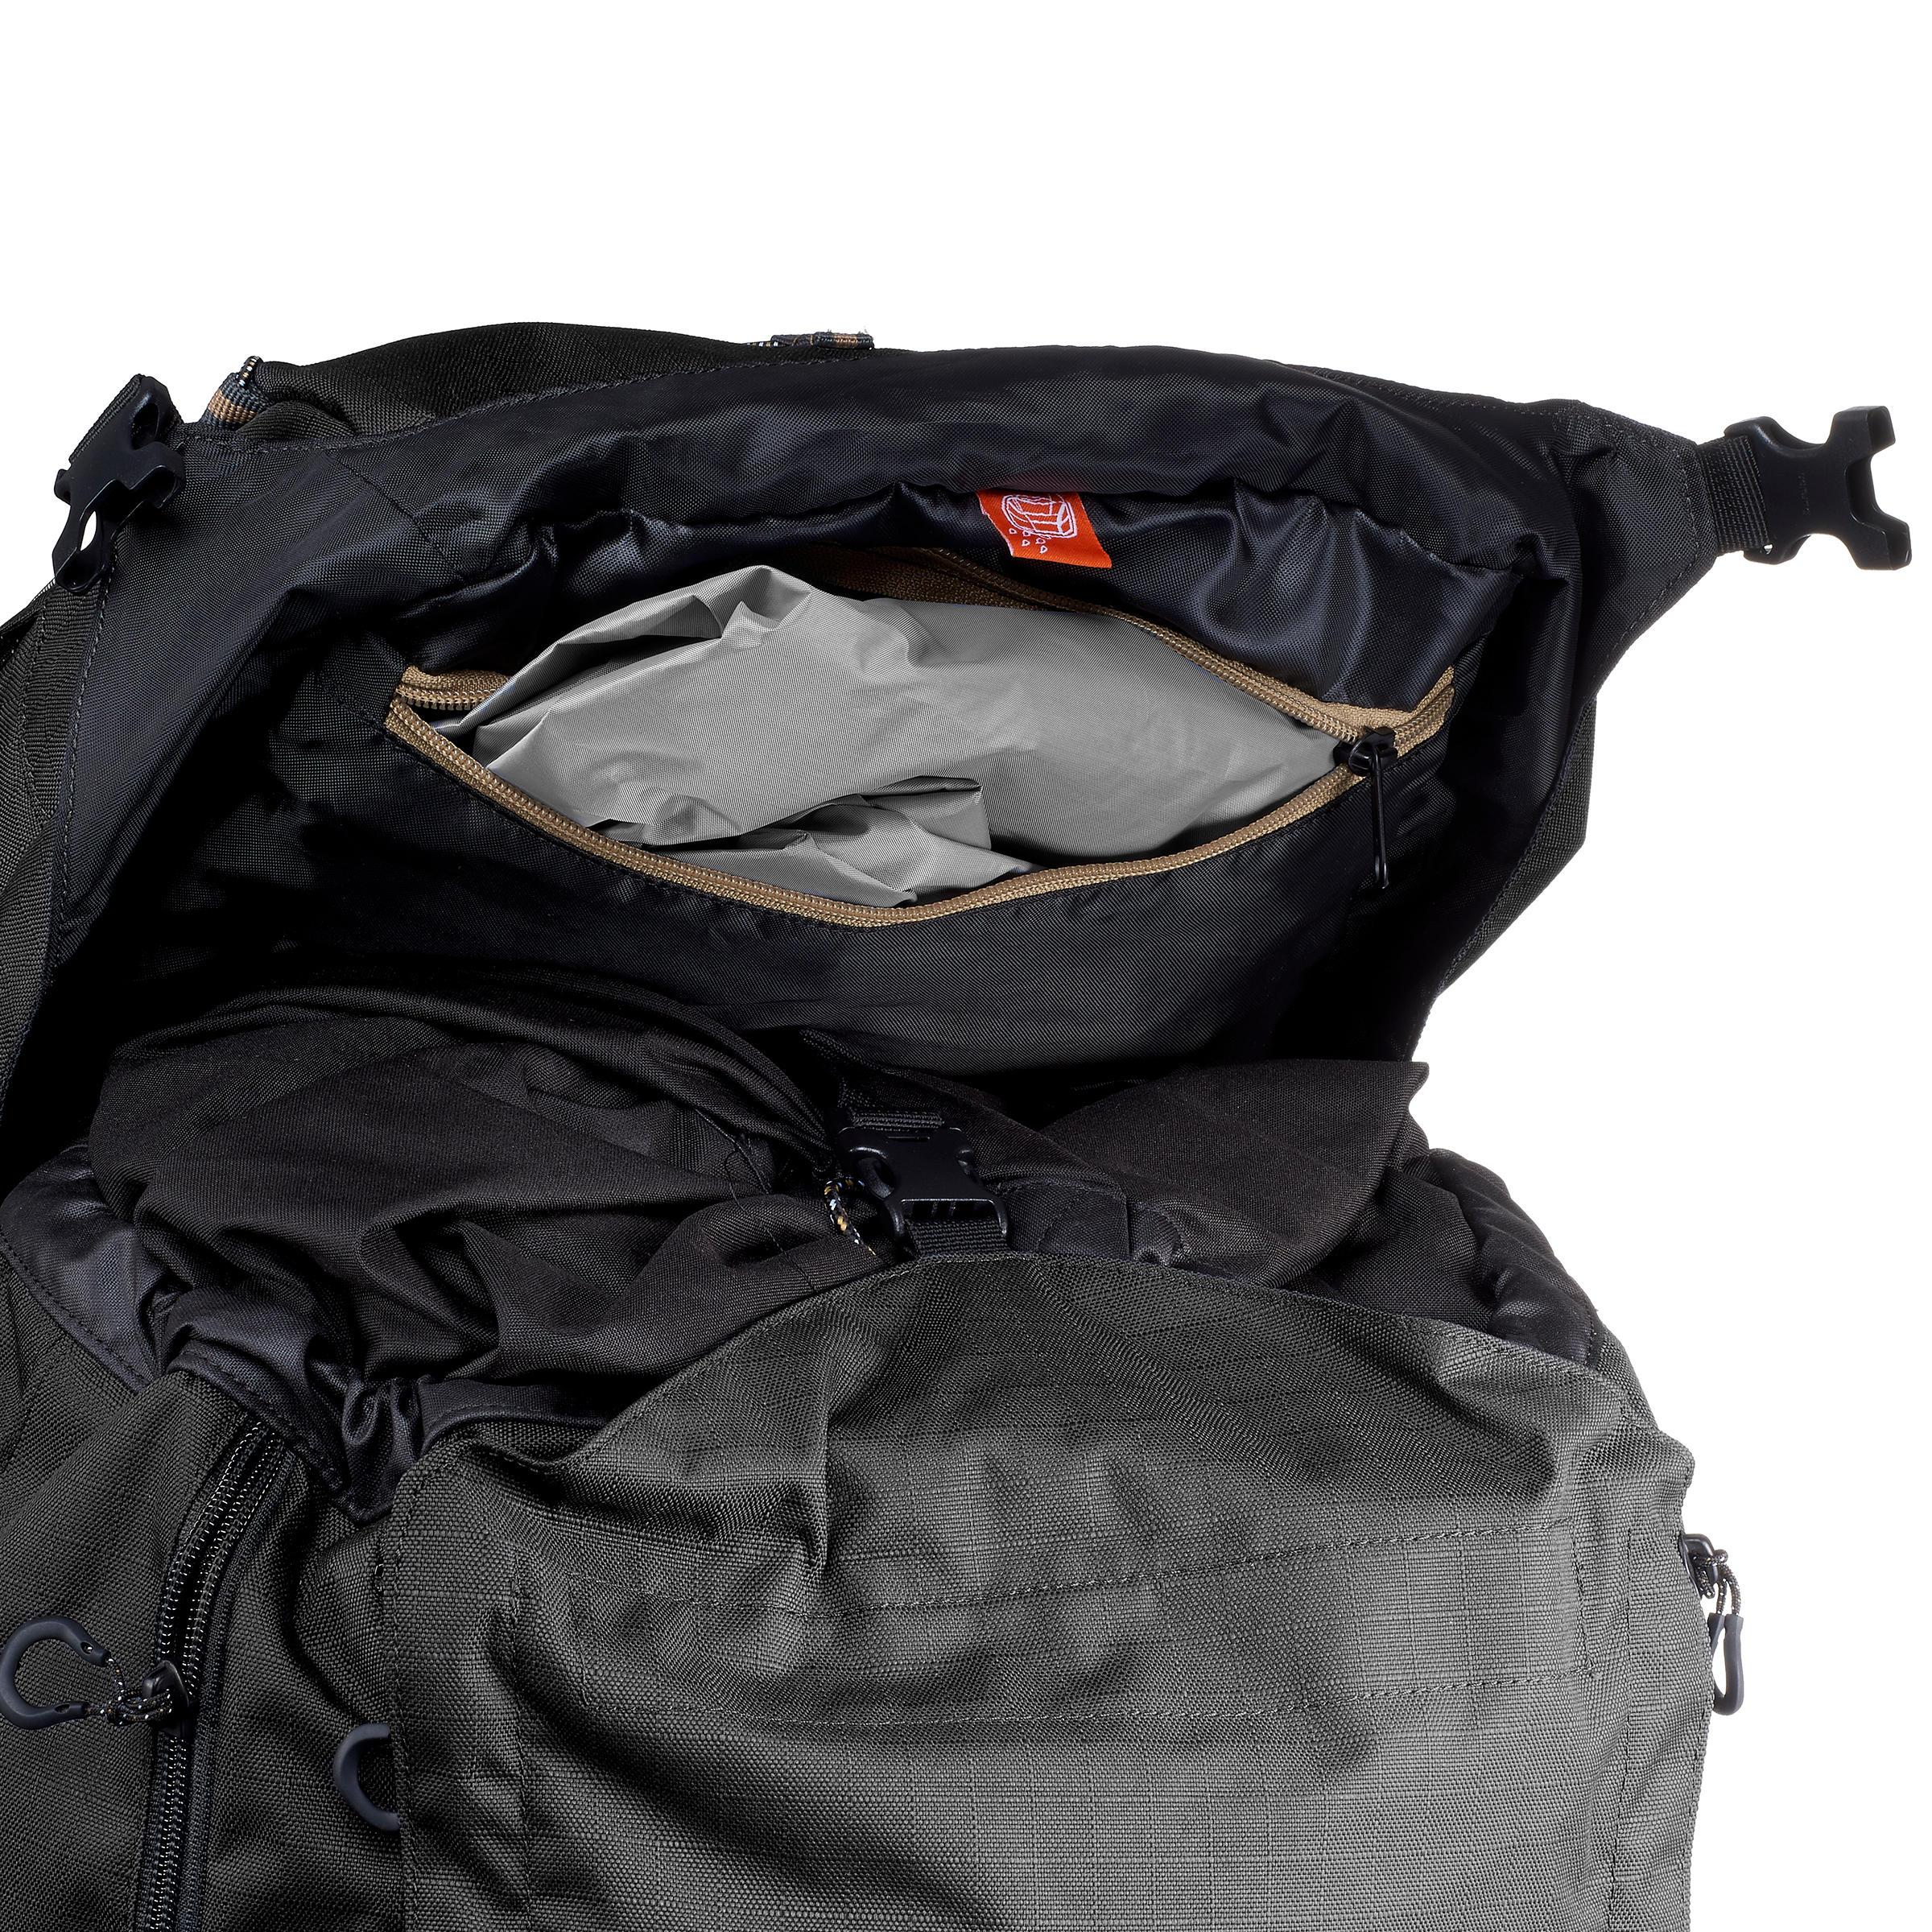 Trek900 Symbium 70L +10L Men's Mountain Trekking Backpack - Grey